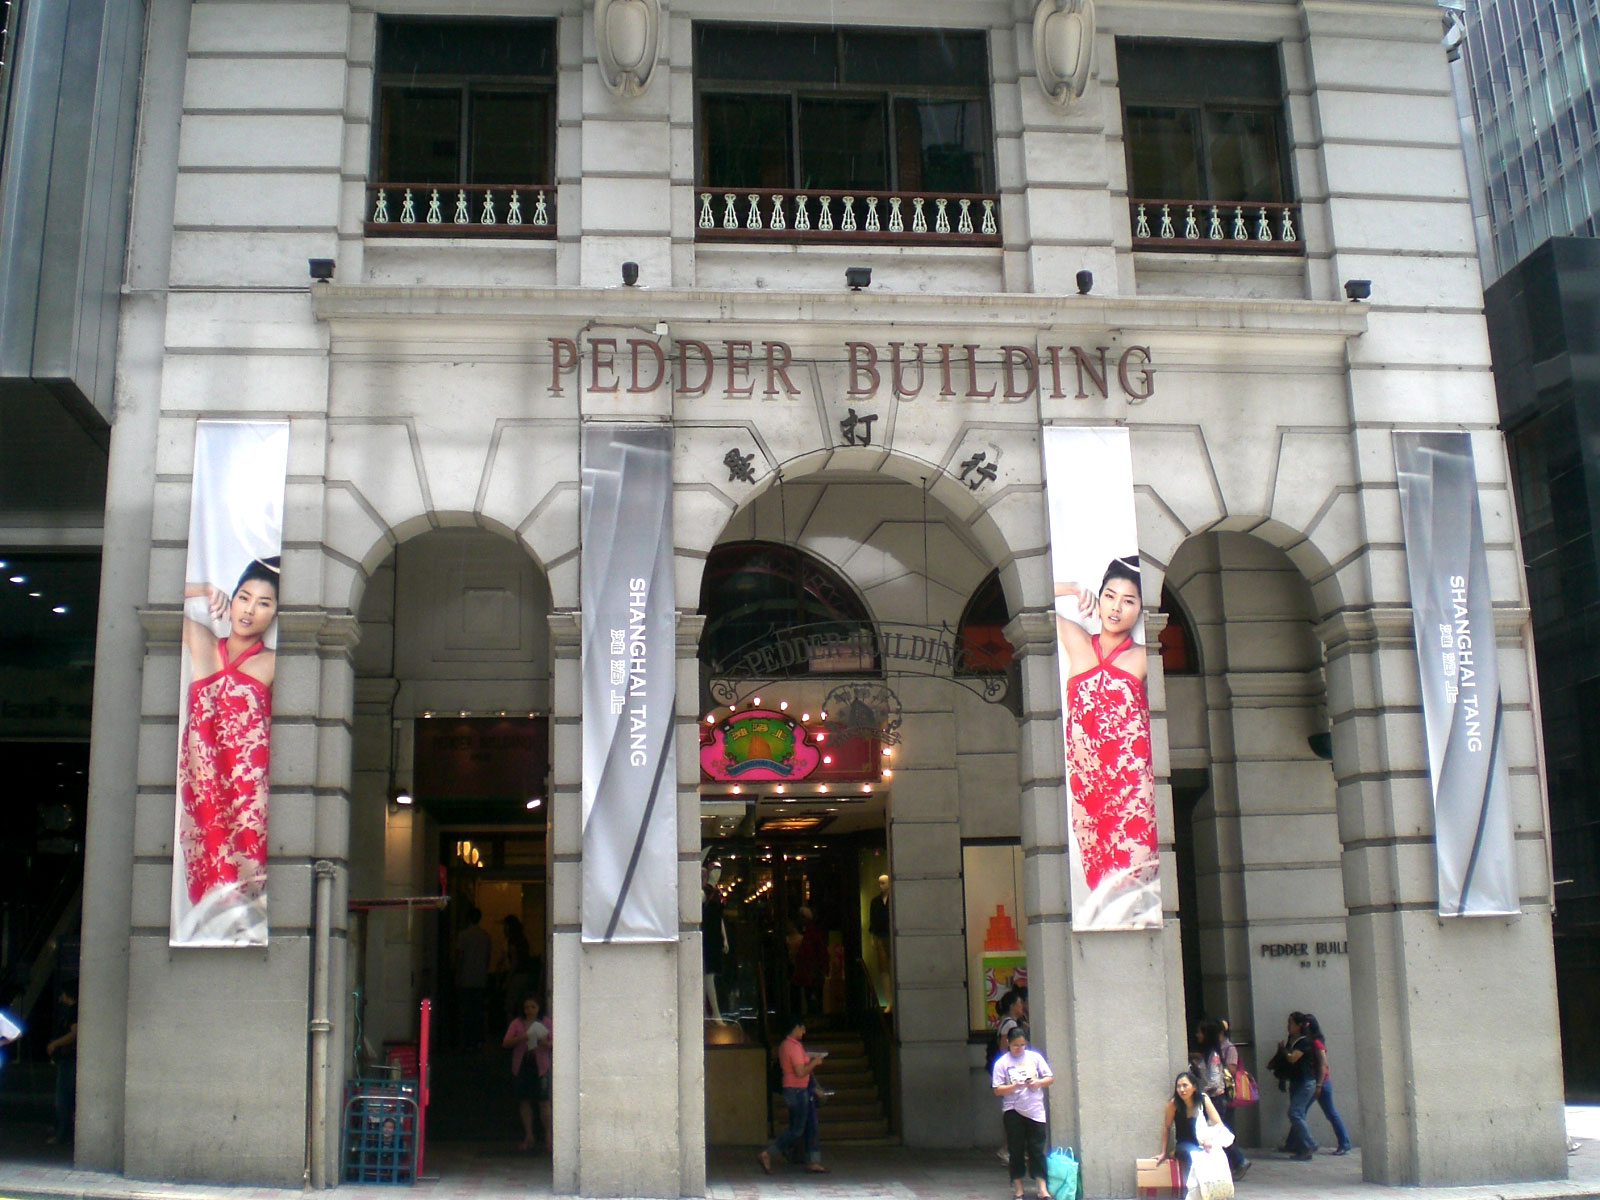 Pedder Building Shanghai